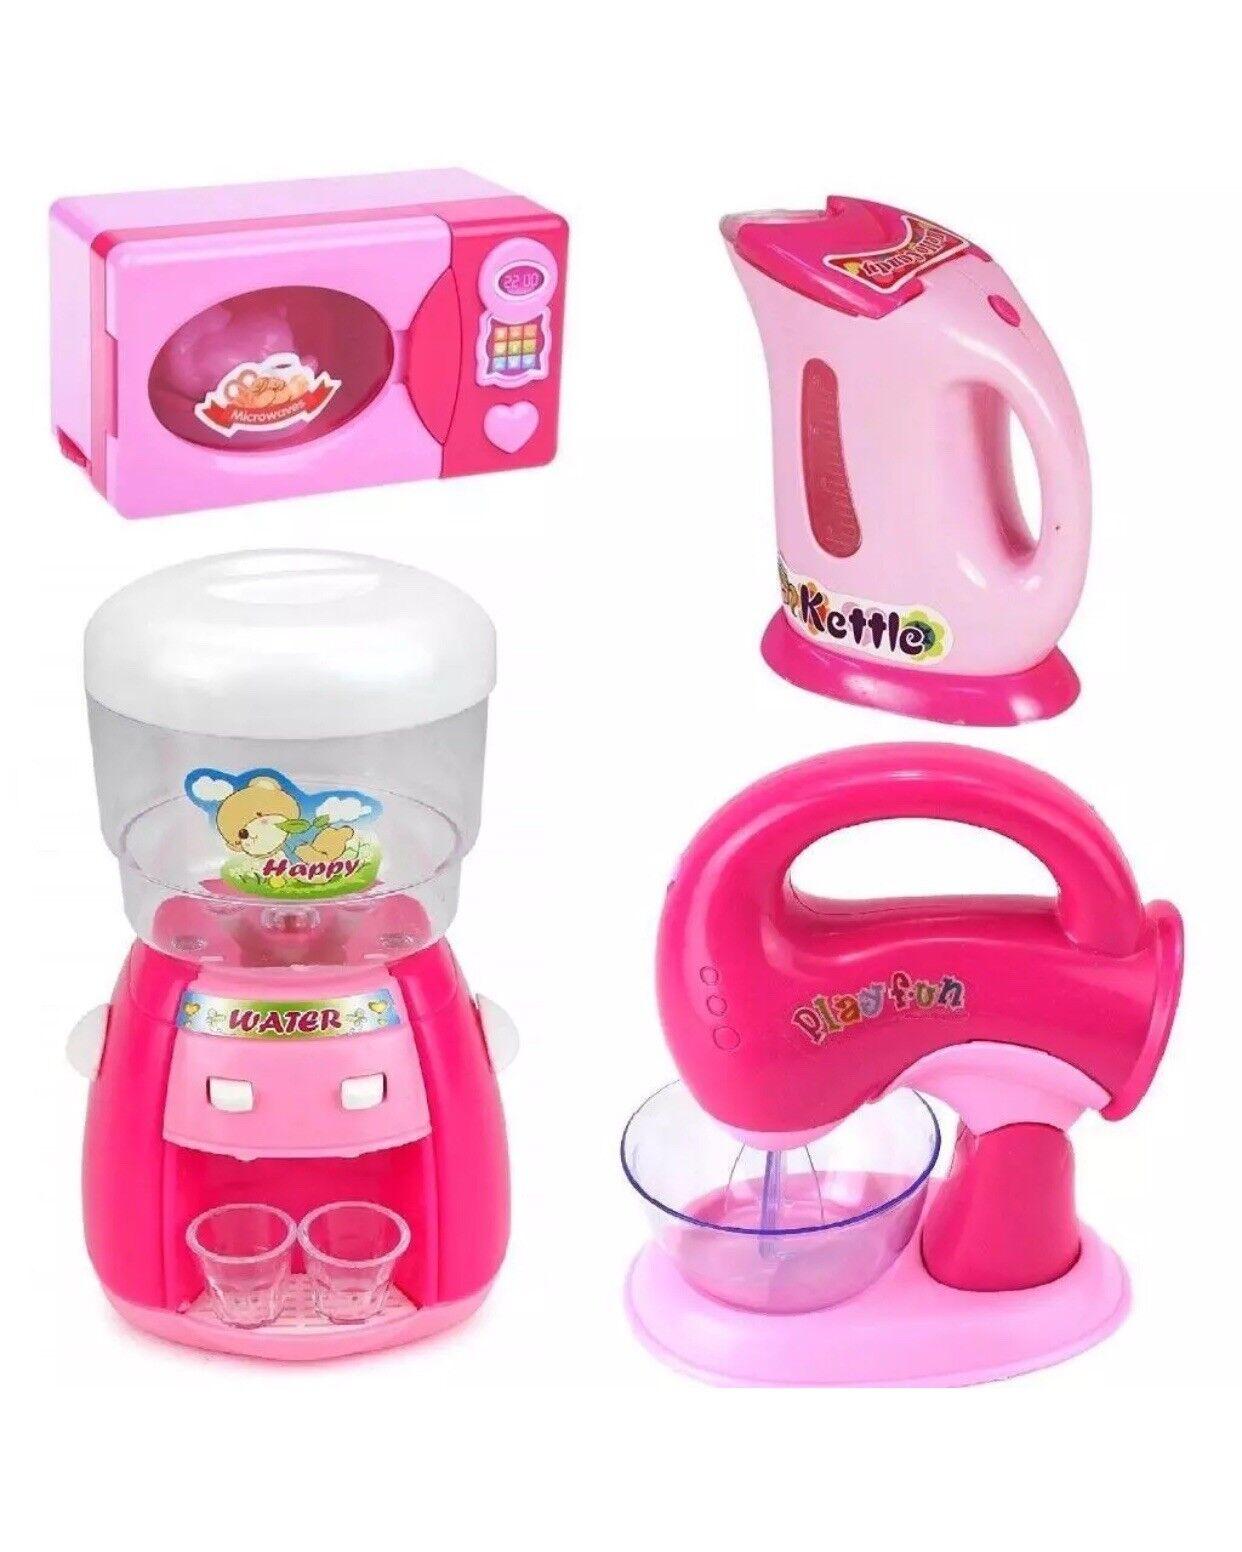 Kids Kitchen Appliances Set Battery Operated Sounds Girls Pretend Play Set